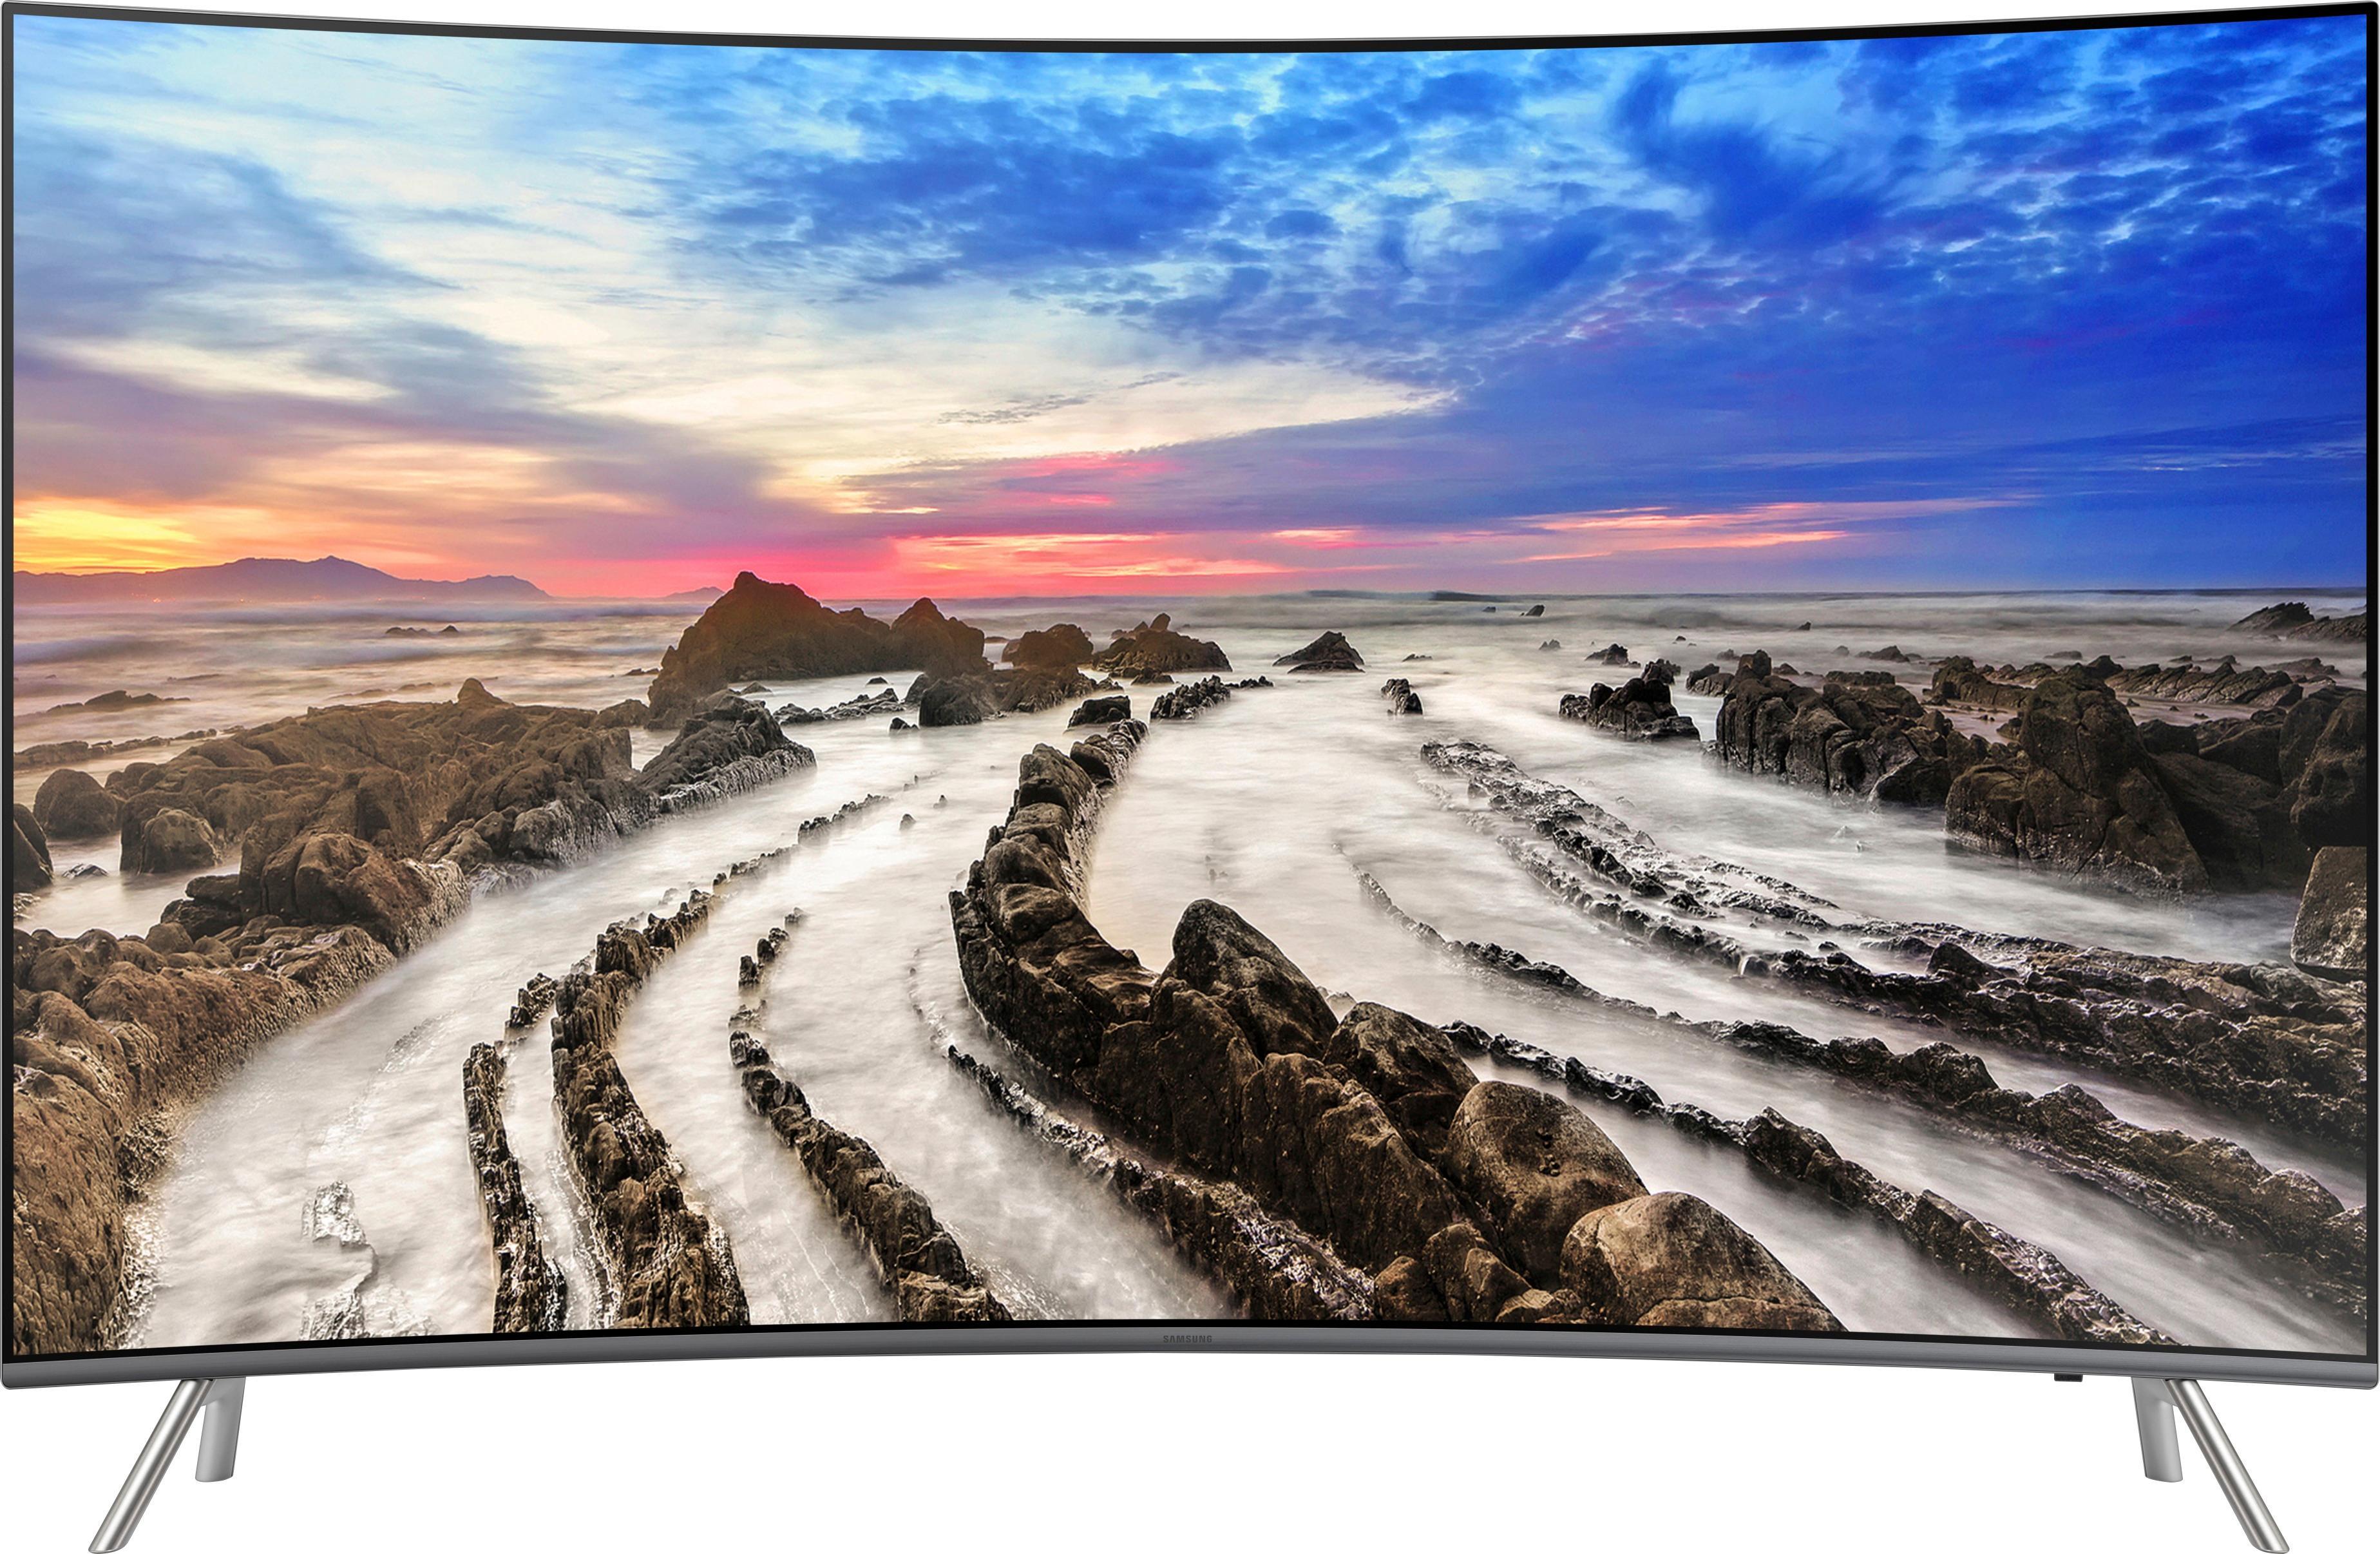 samsung curved tv 55 inch 4k. samsung - 55\ curved tv 55 inch 4k h